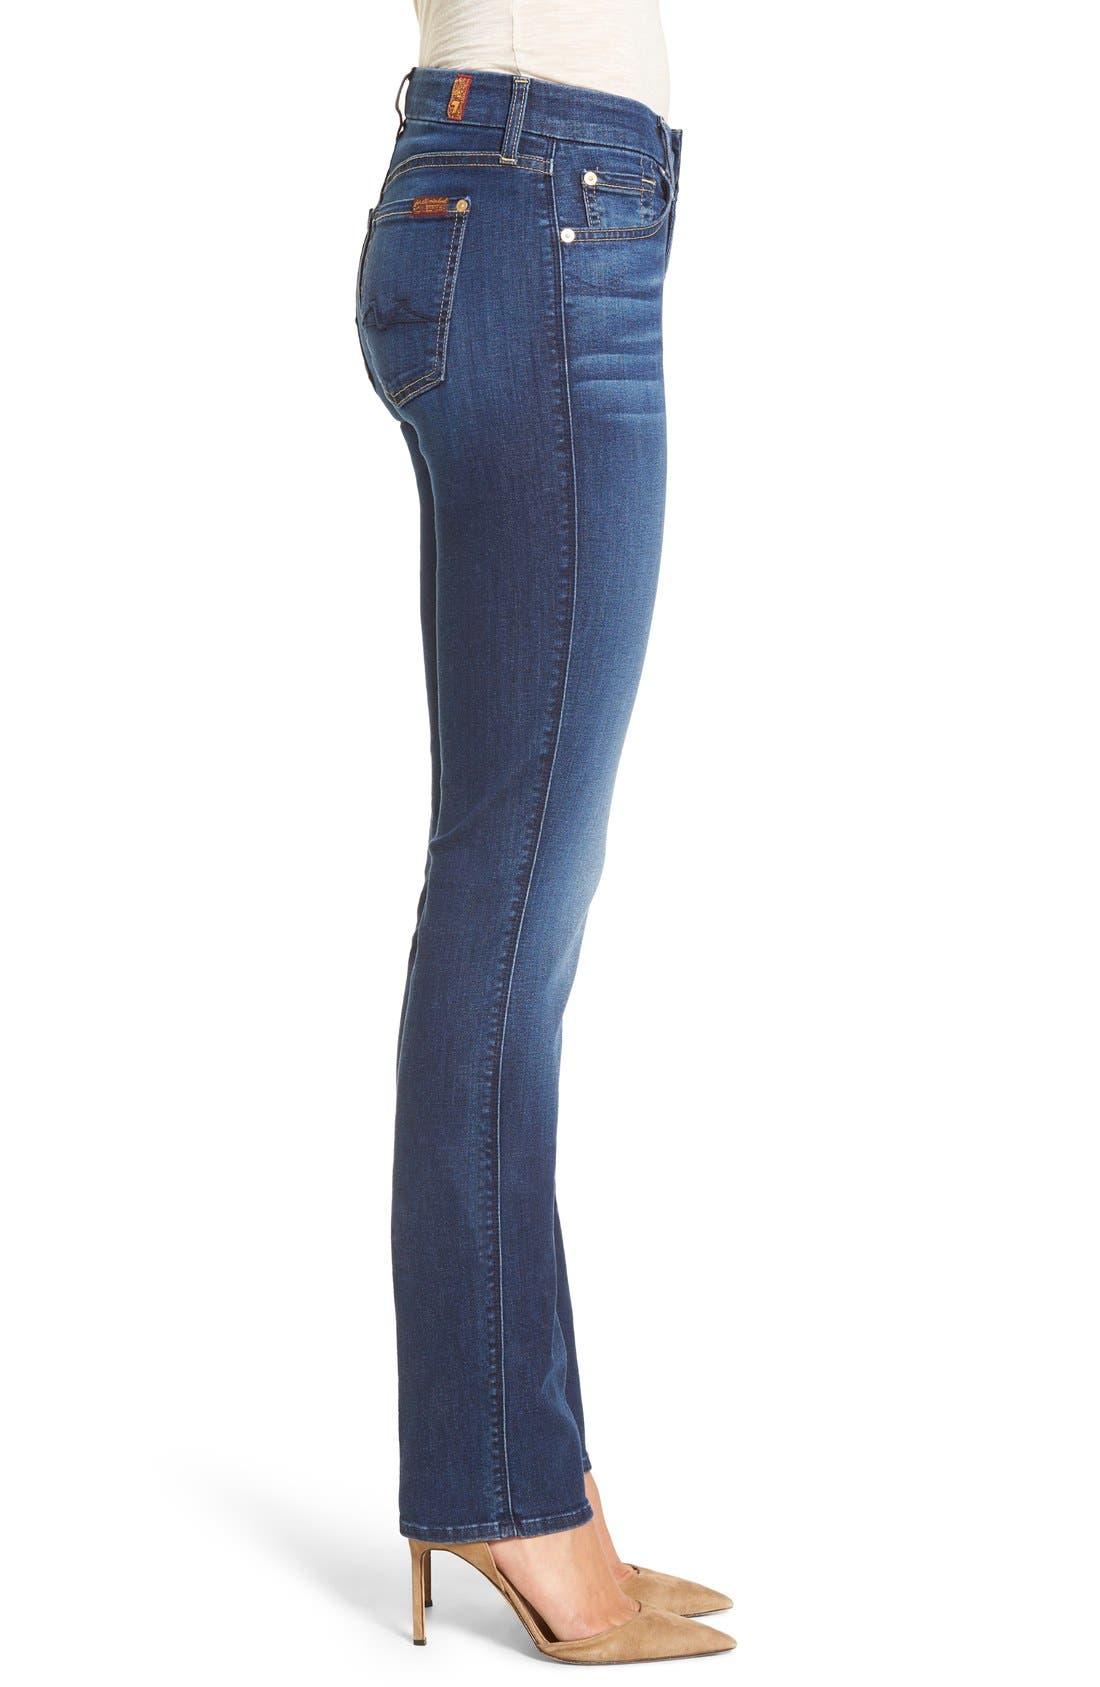 7 FOR ALL MANKIND<SUP>®</SUP>, b(air) Kimmie Straight Leg Jeans, Alternate thumbnail 3, color, DUCHESS